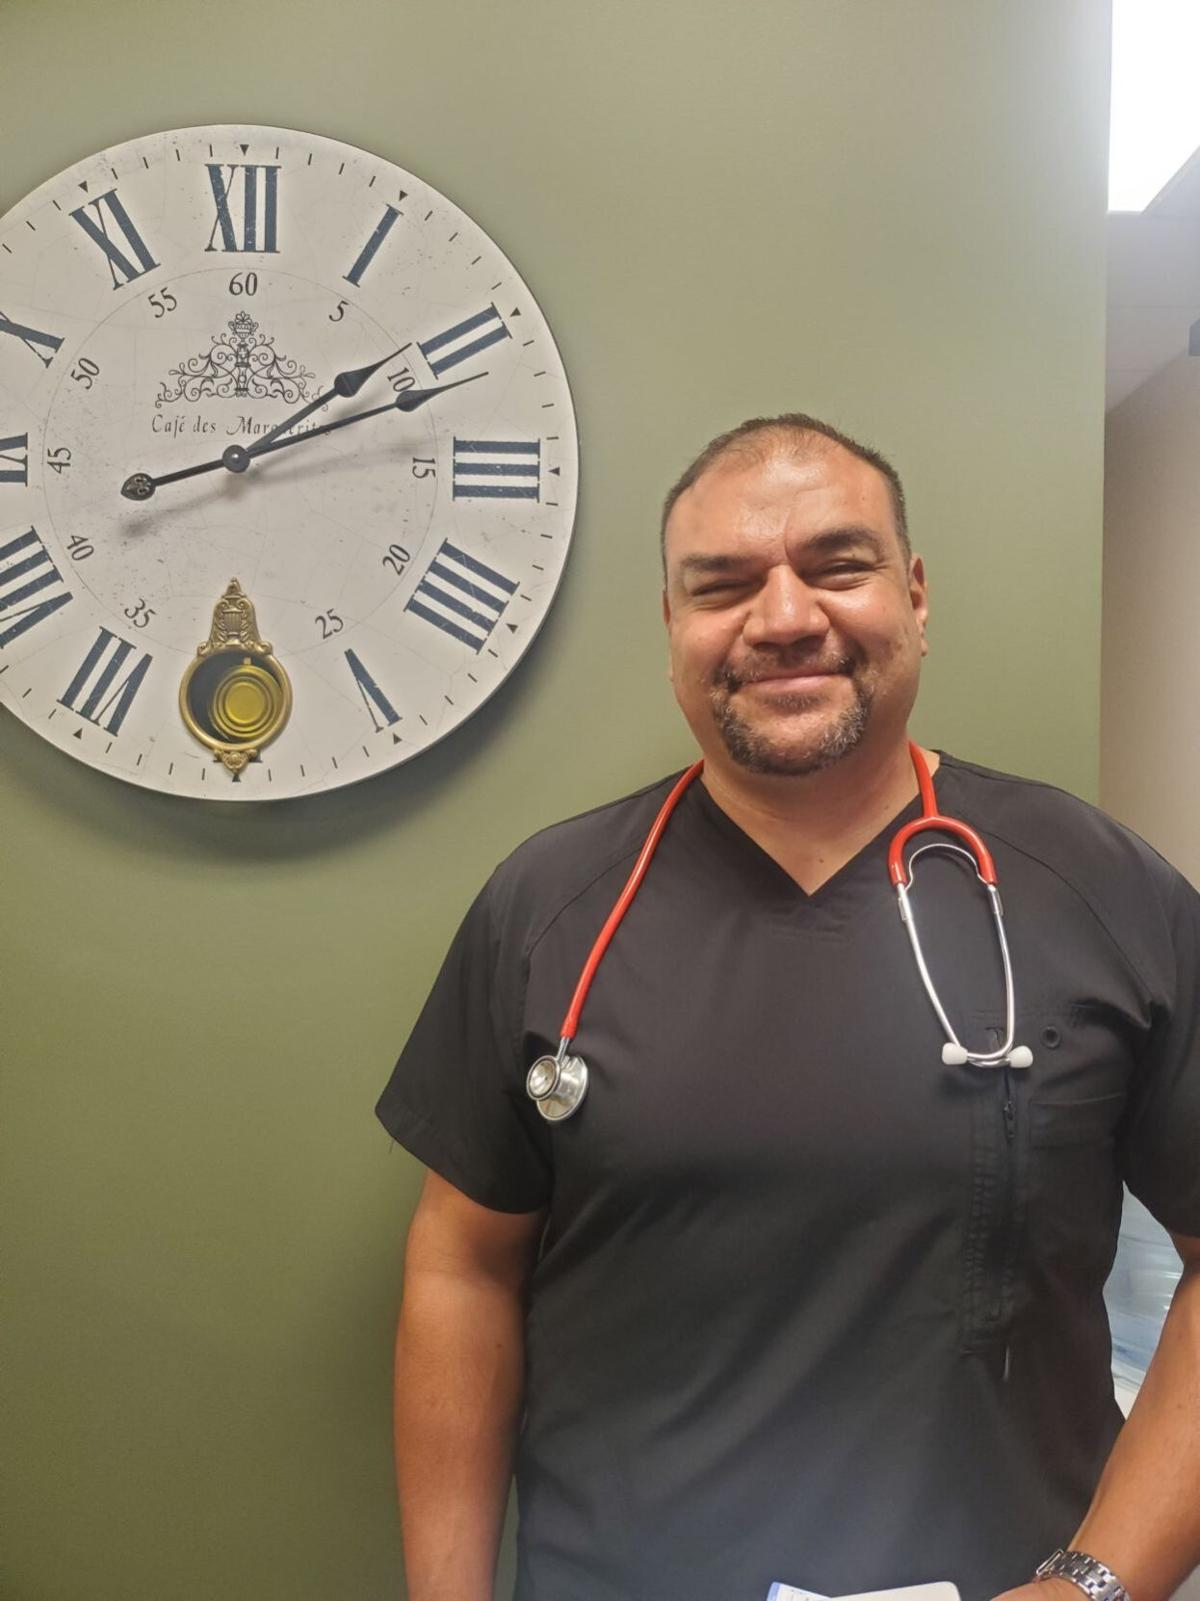 Dr. Pacheco